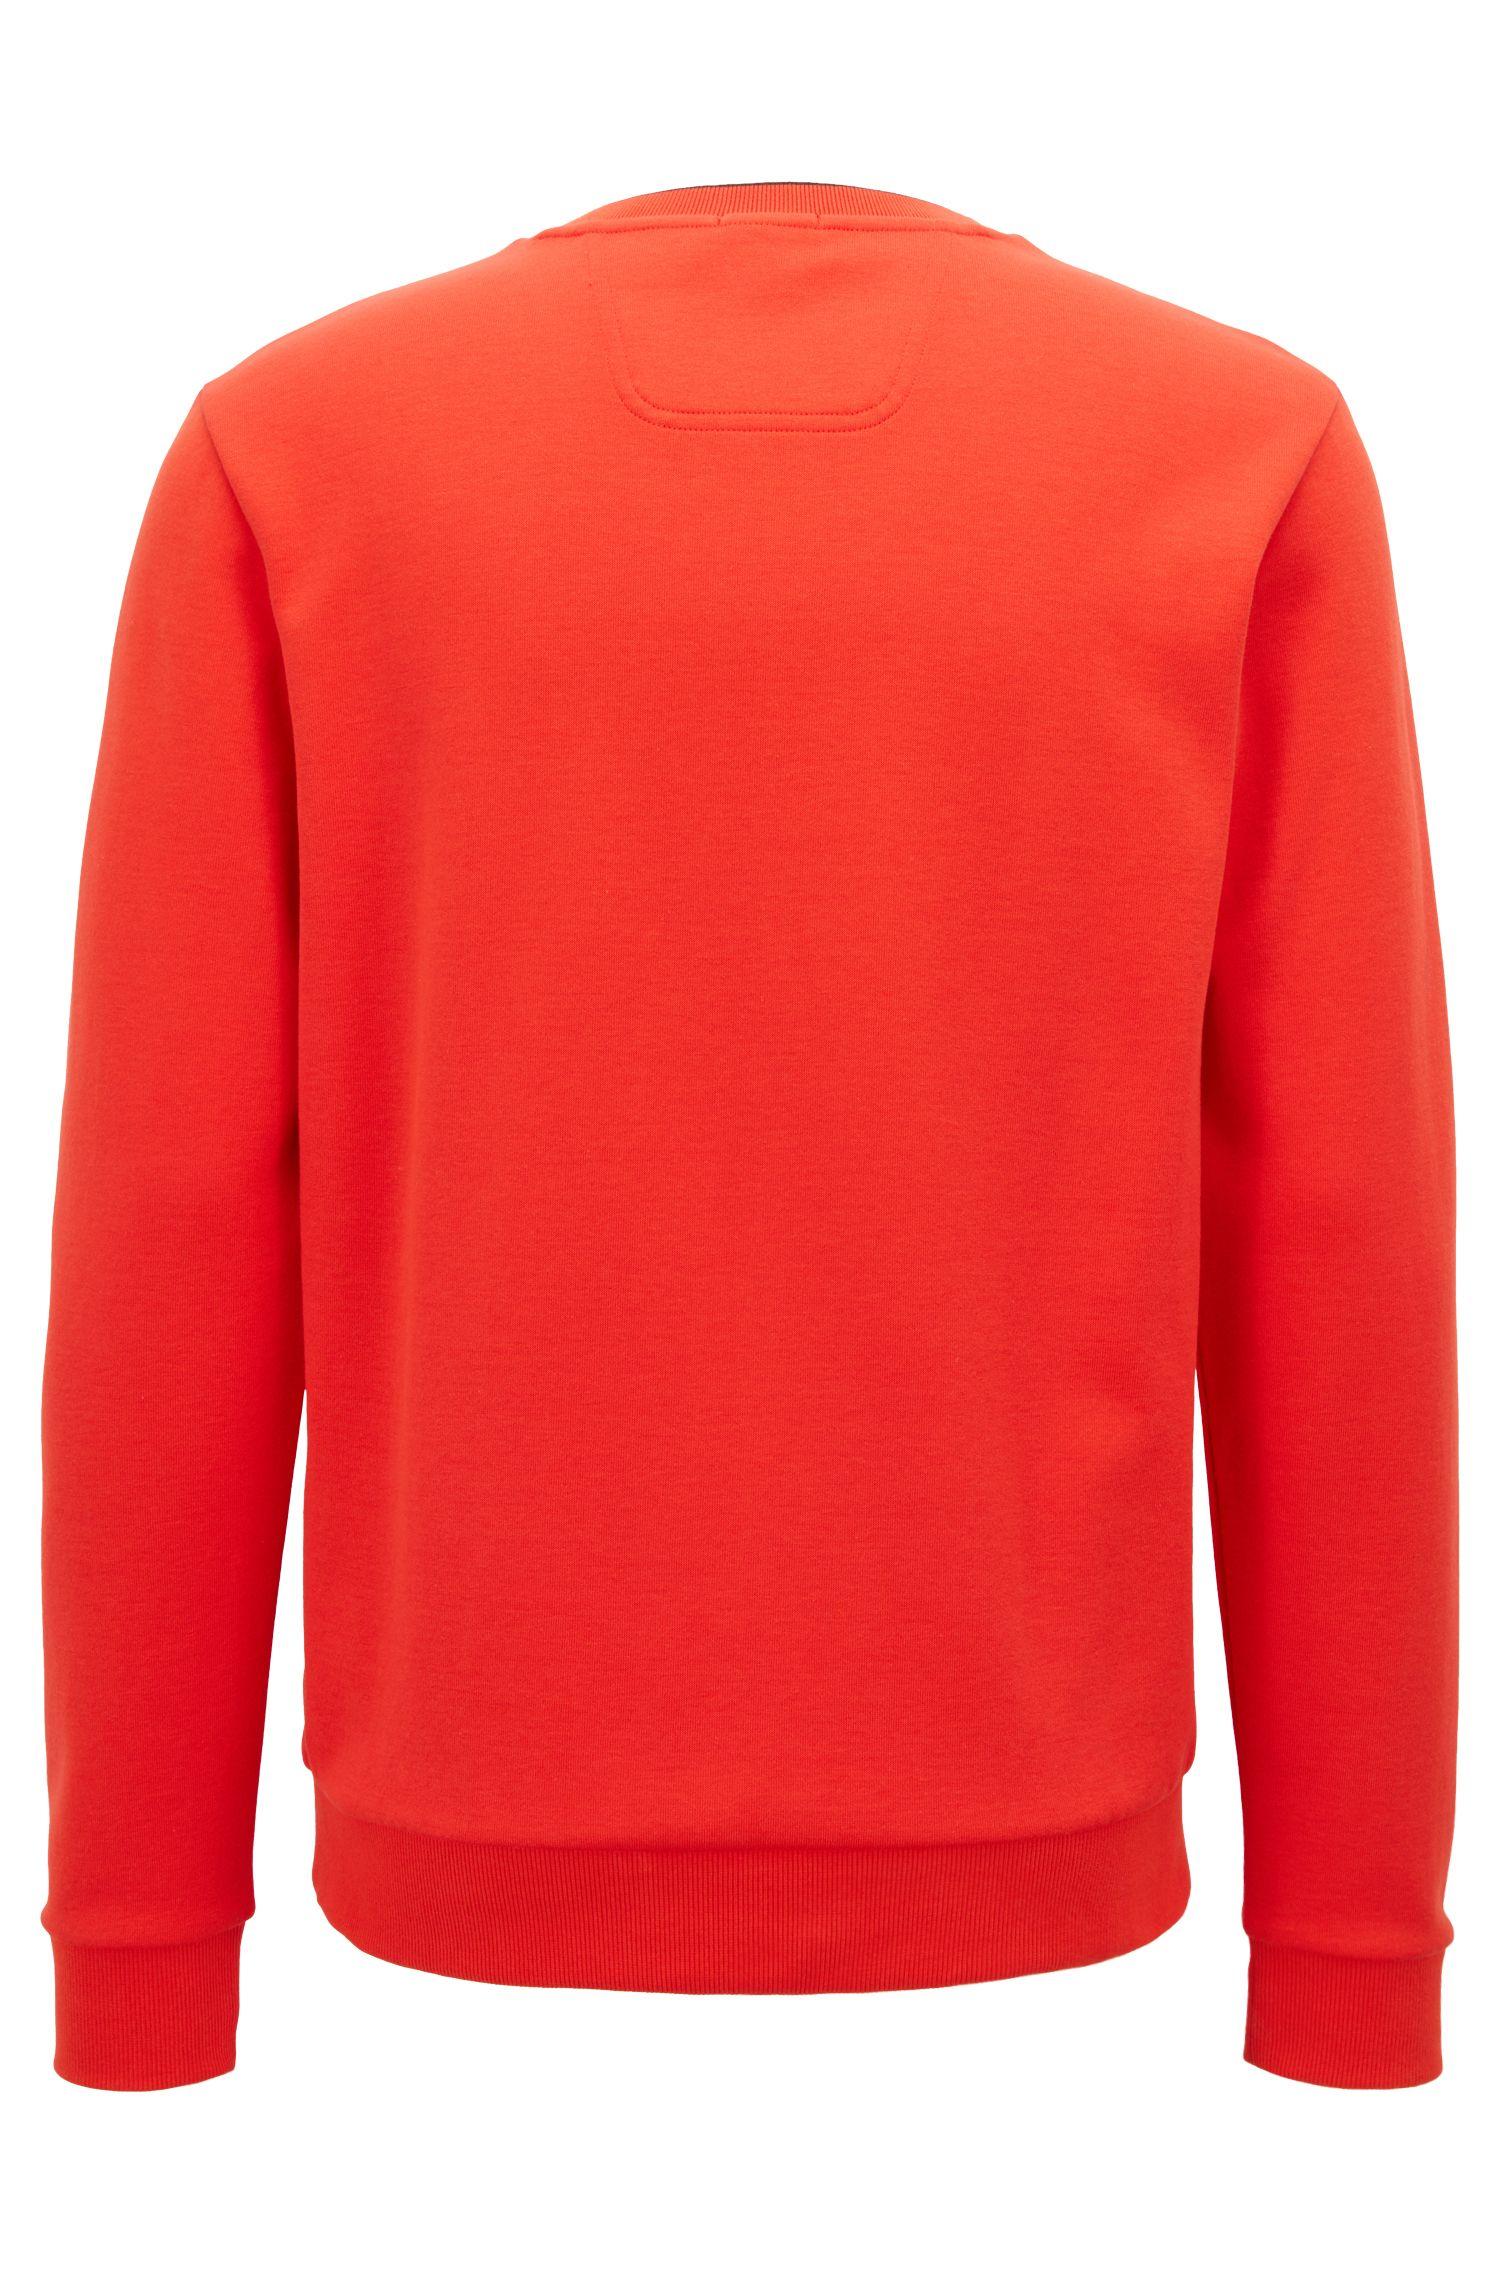 Slim-fit sweatshirt with tonal embossed logo, Orange